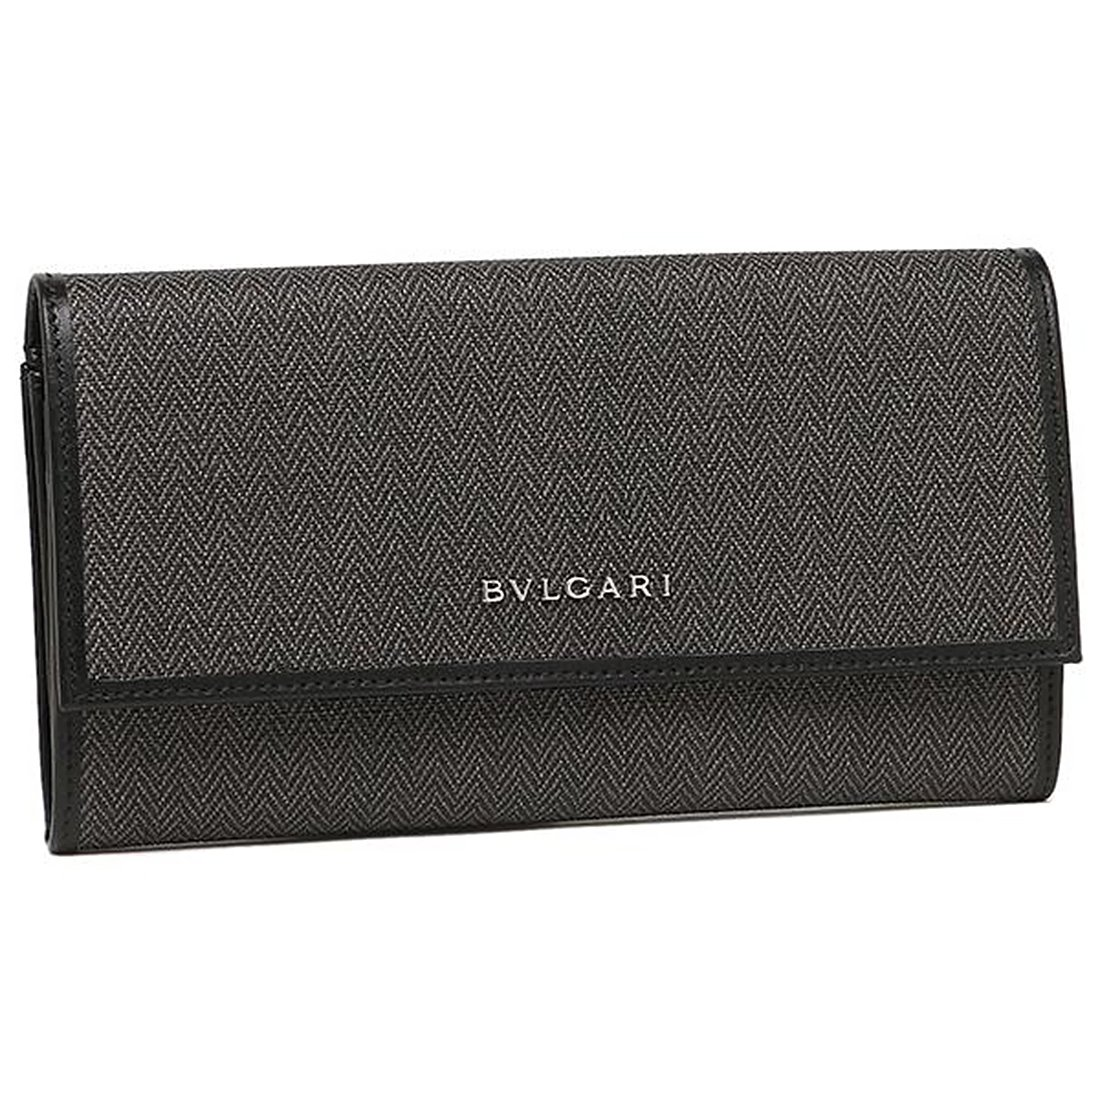 243e82f8acd6 Amazon   [ブルガリ] 長財布 レディース BVLGARI 32585 WEEKEND ブラック [並行輸入品]   財布